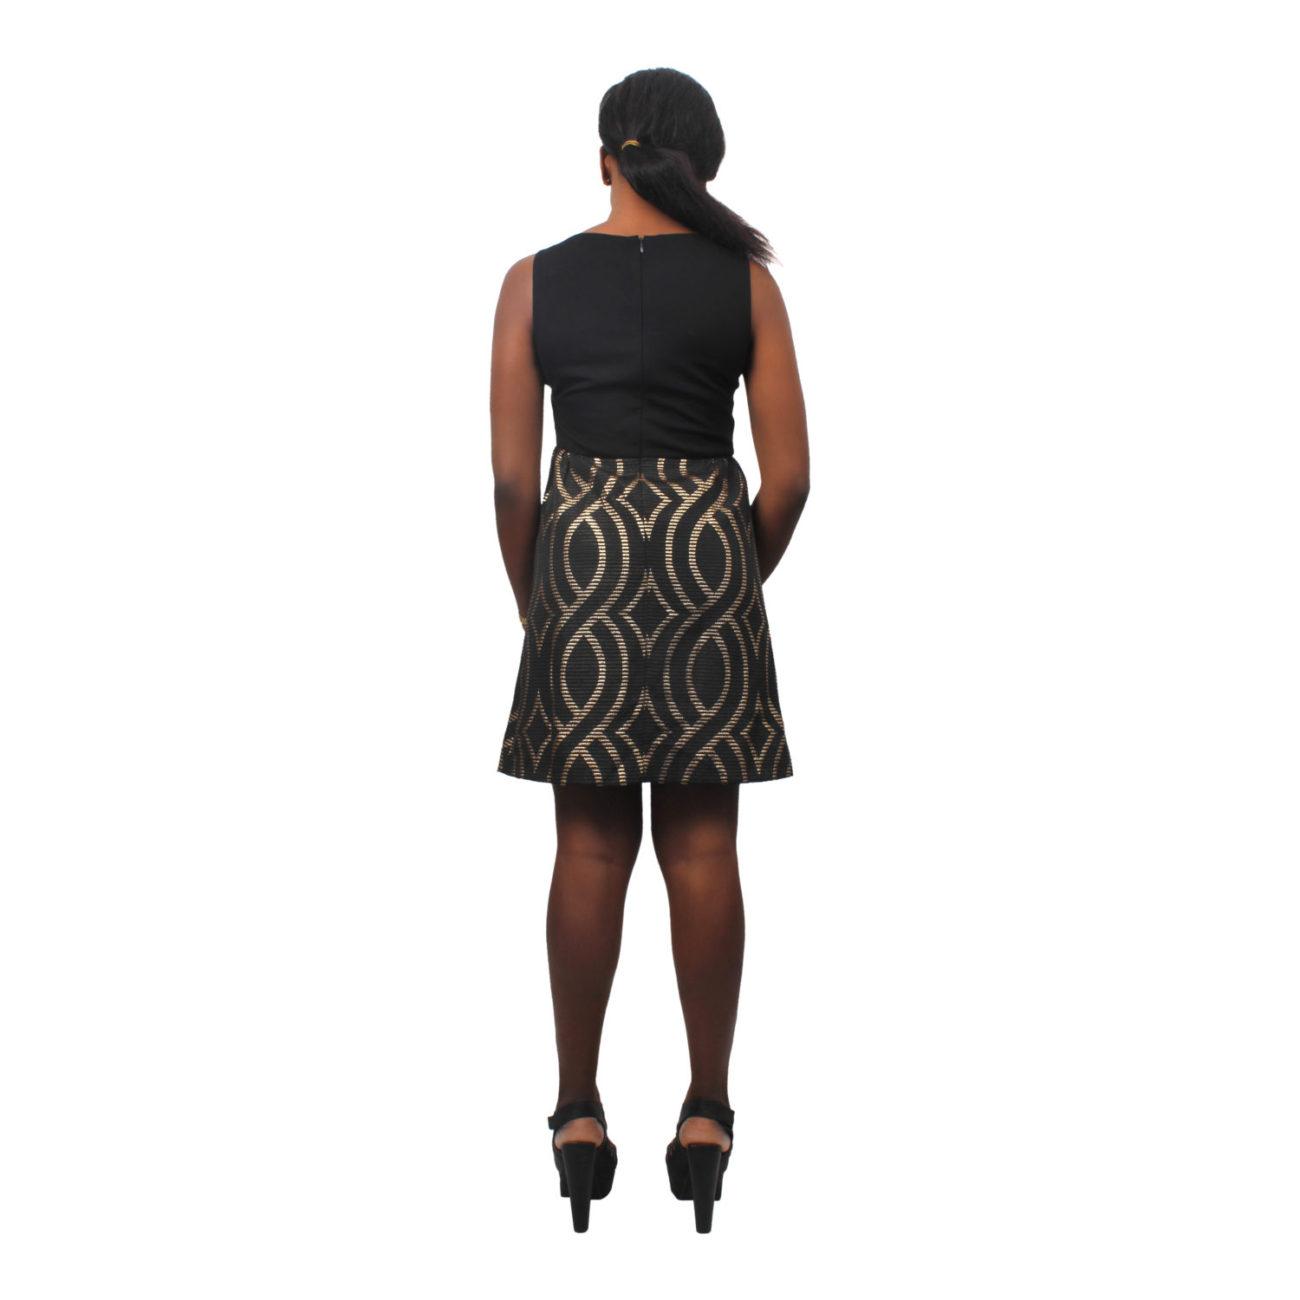 afec0518cfb Antonio Melani Dress